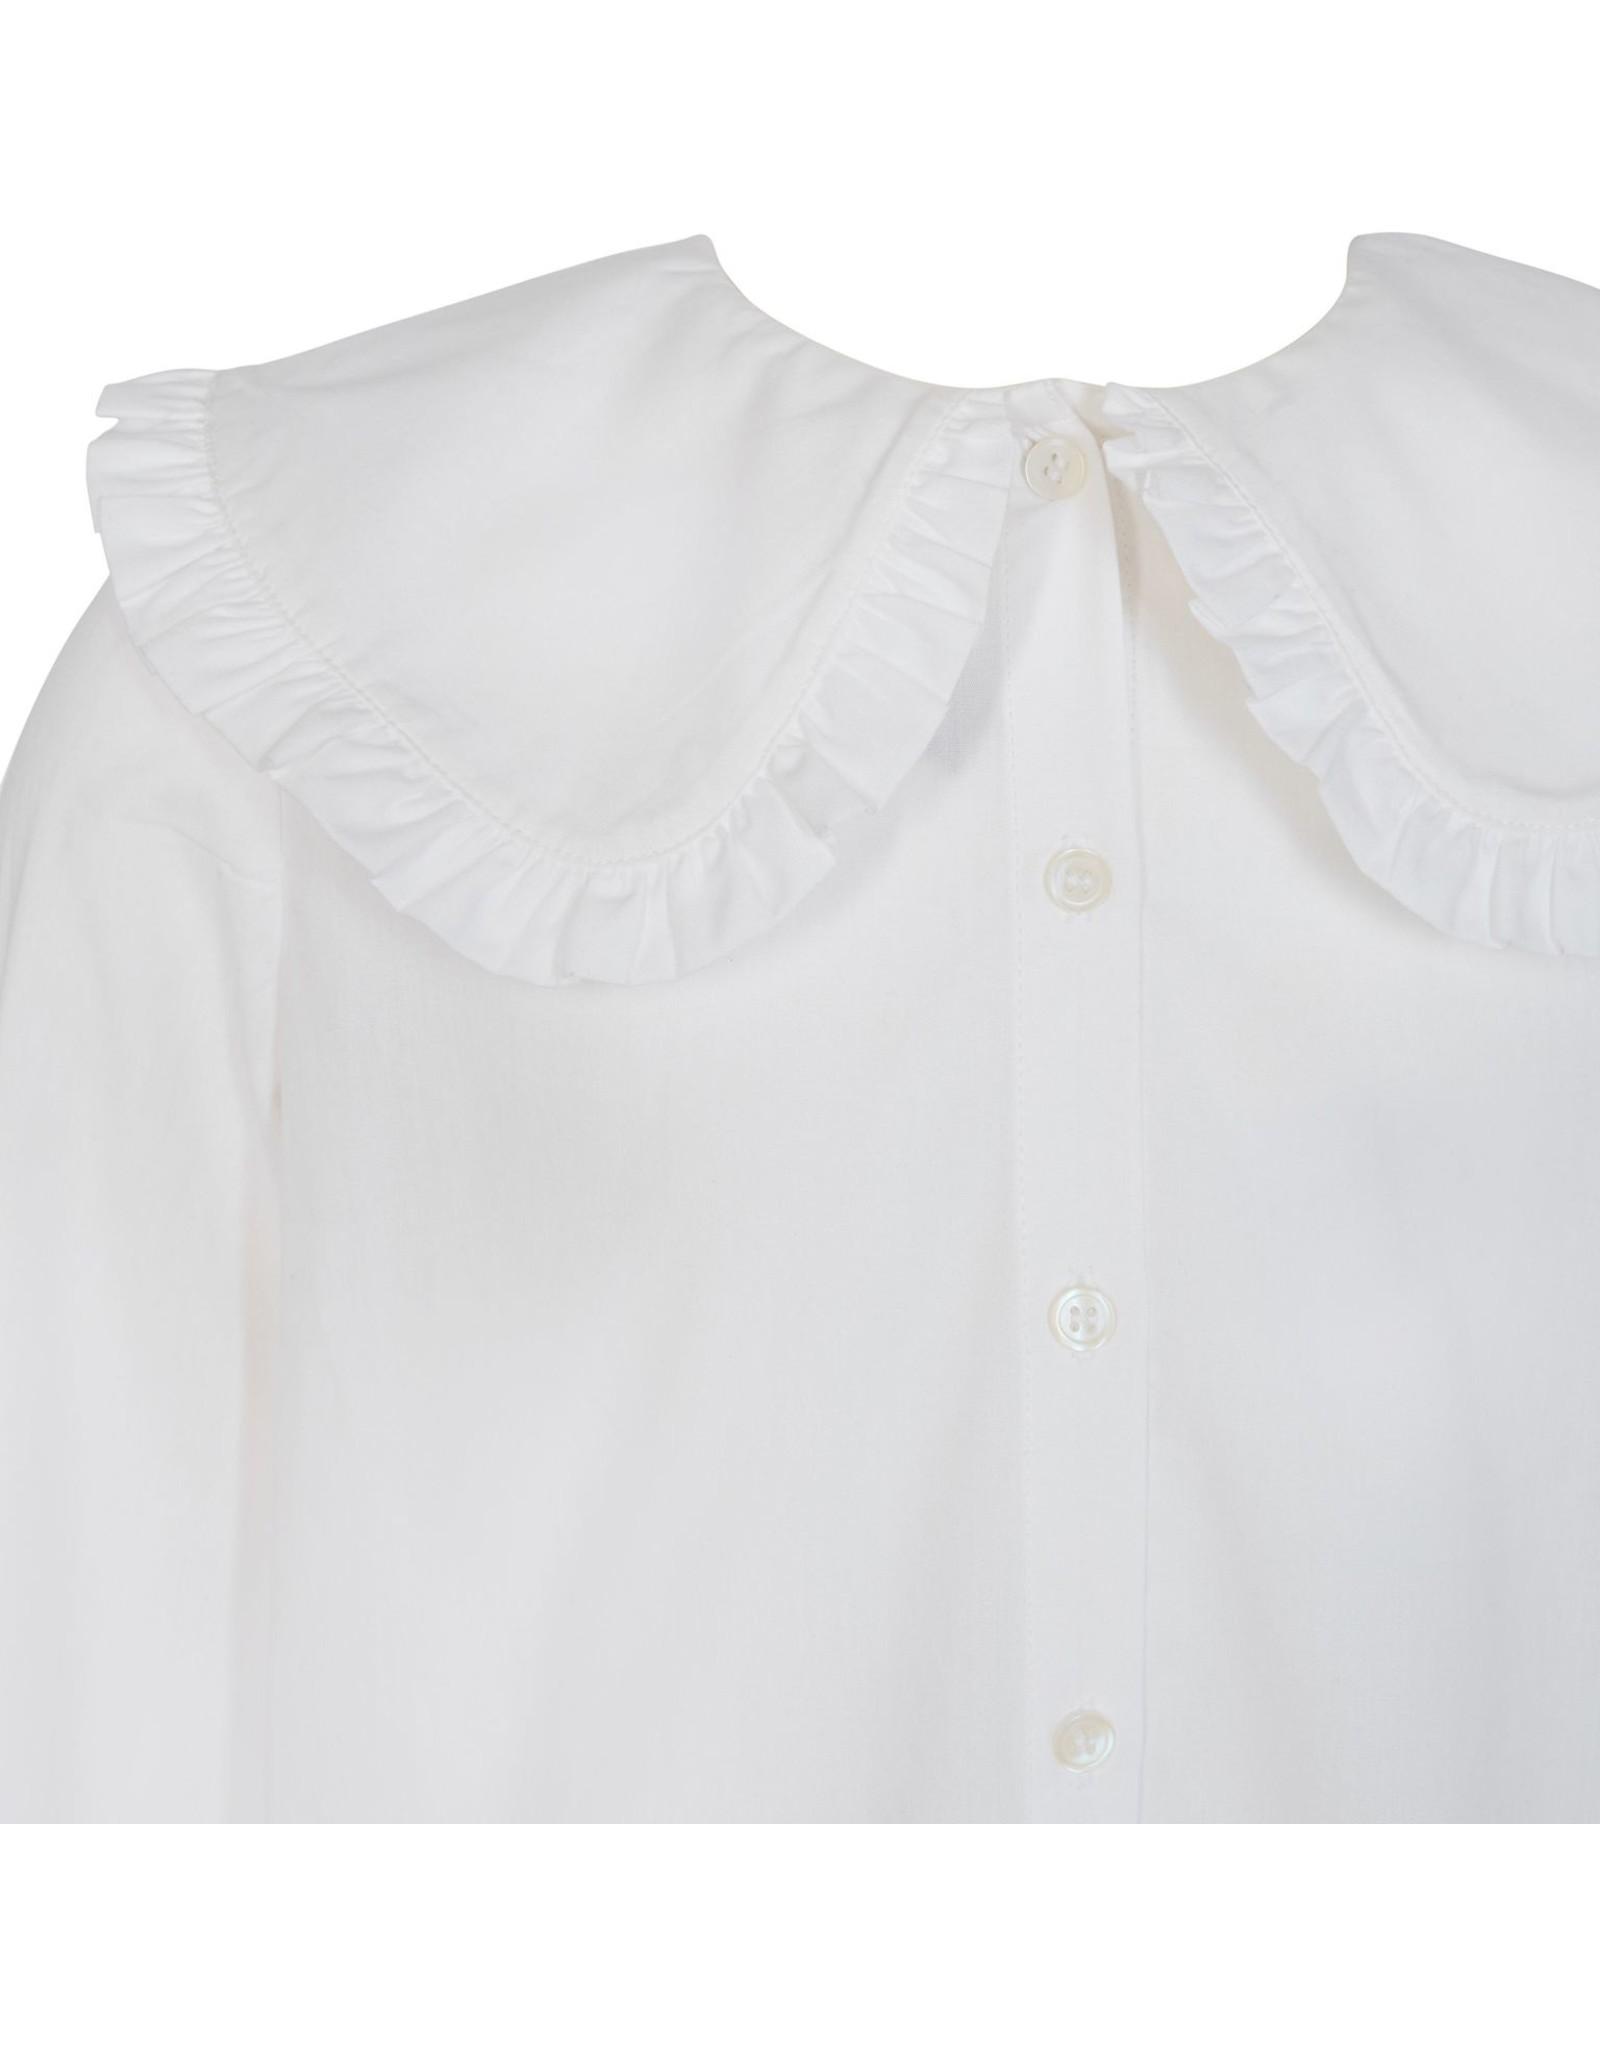 Petit by Sofie Schnoor hemd wit